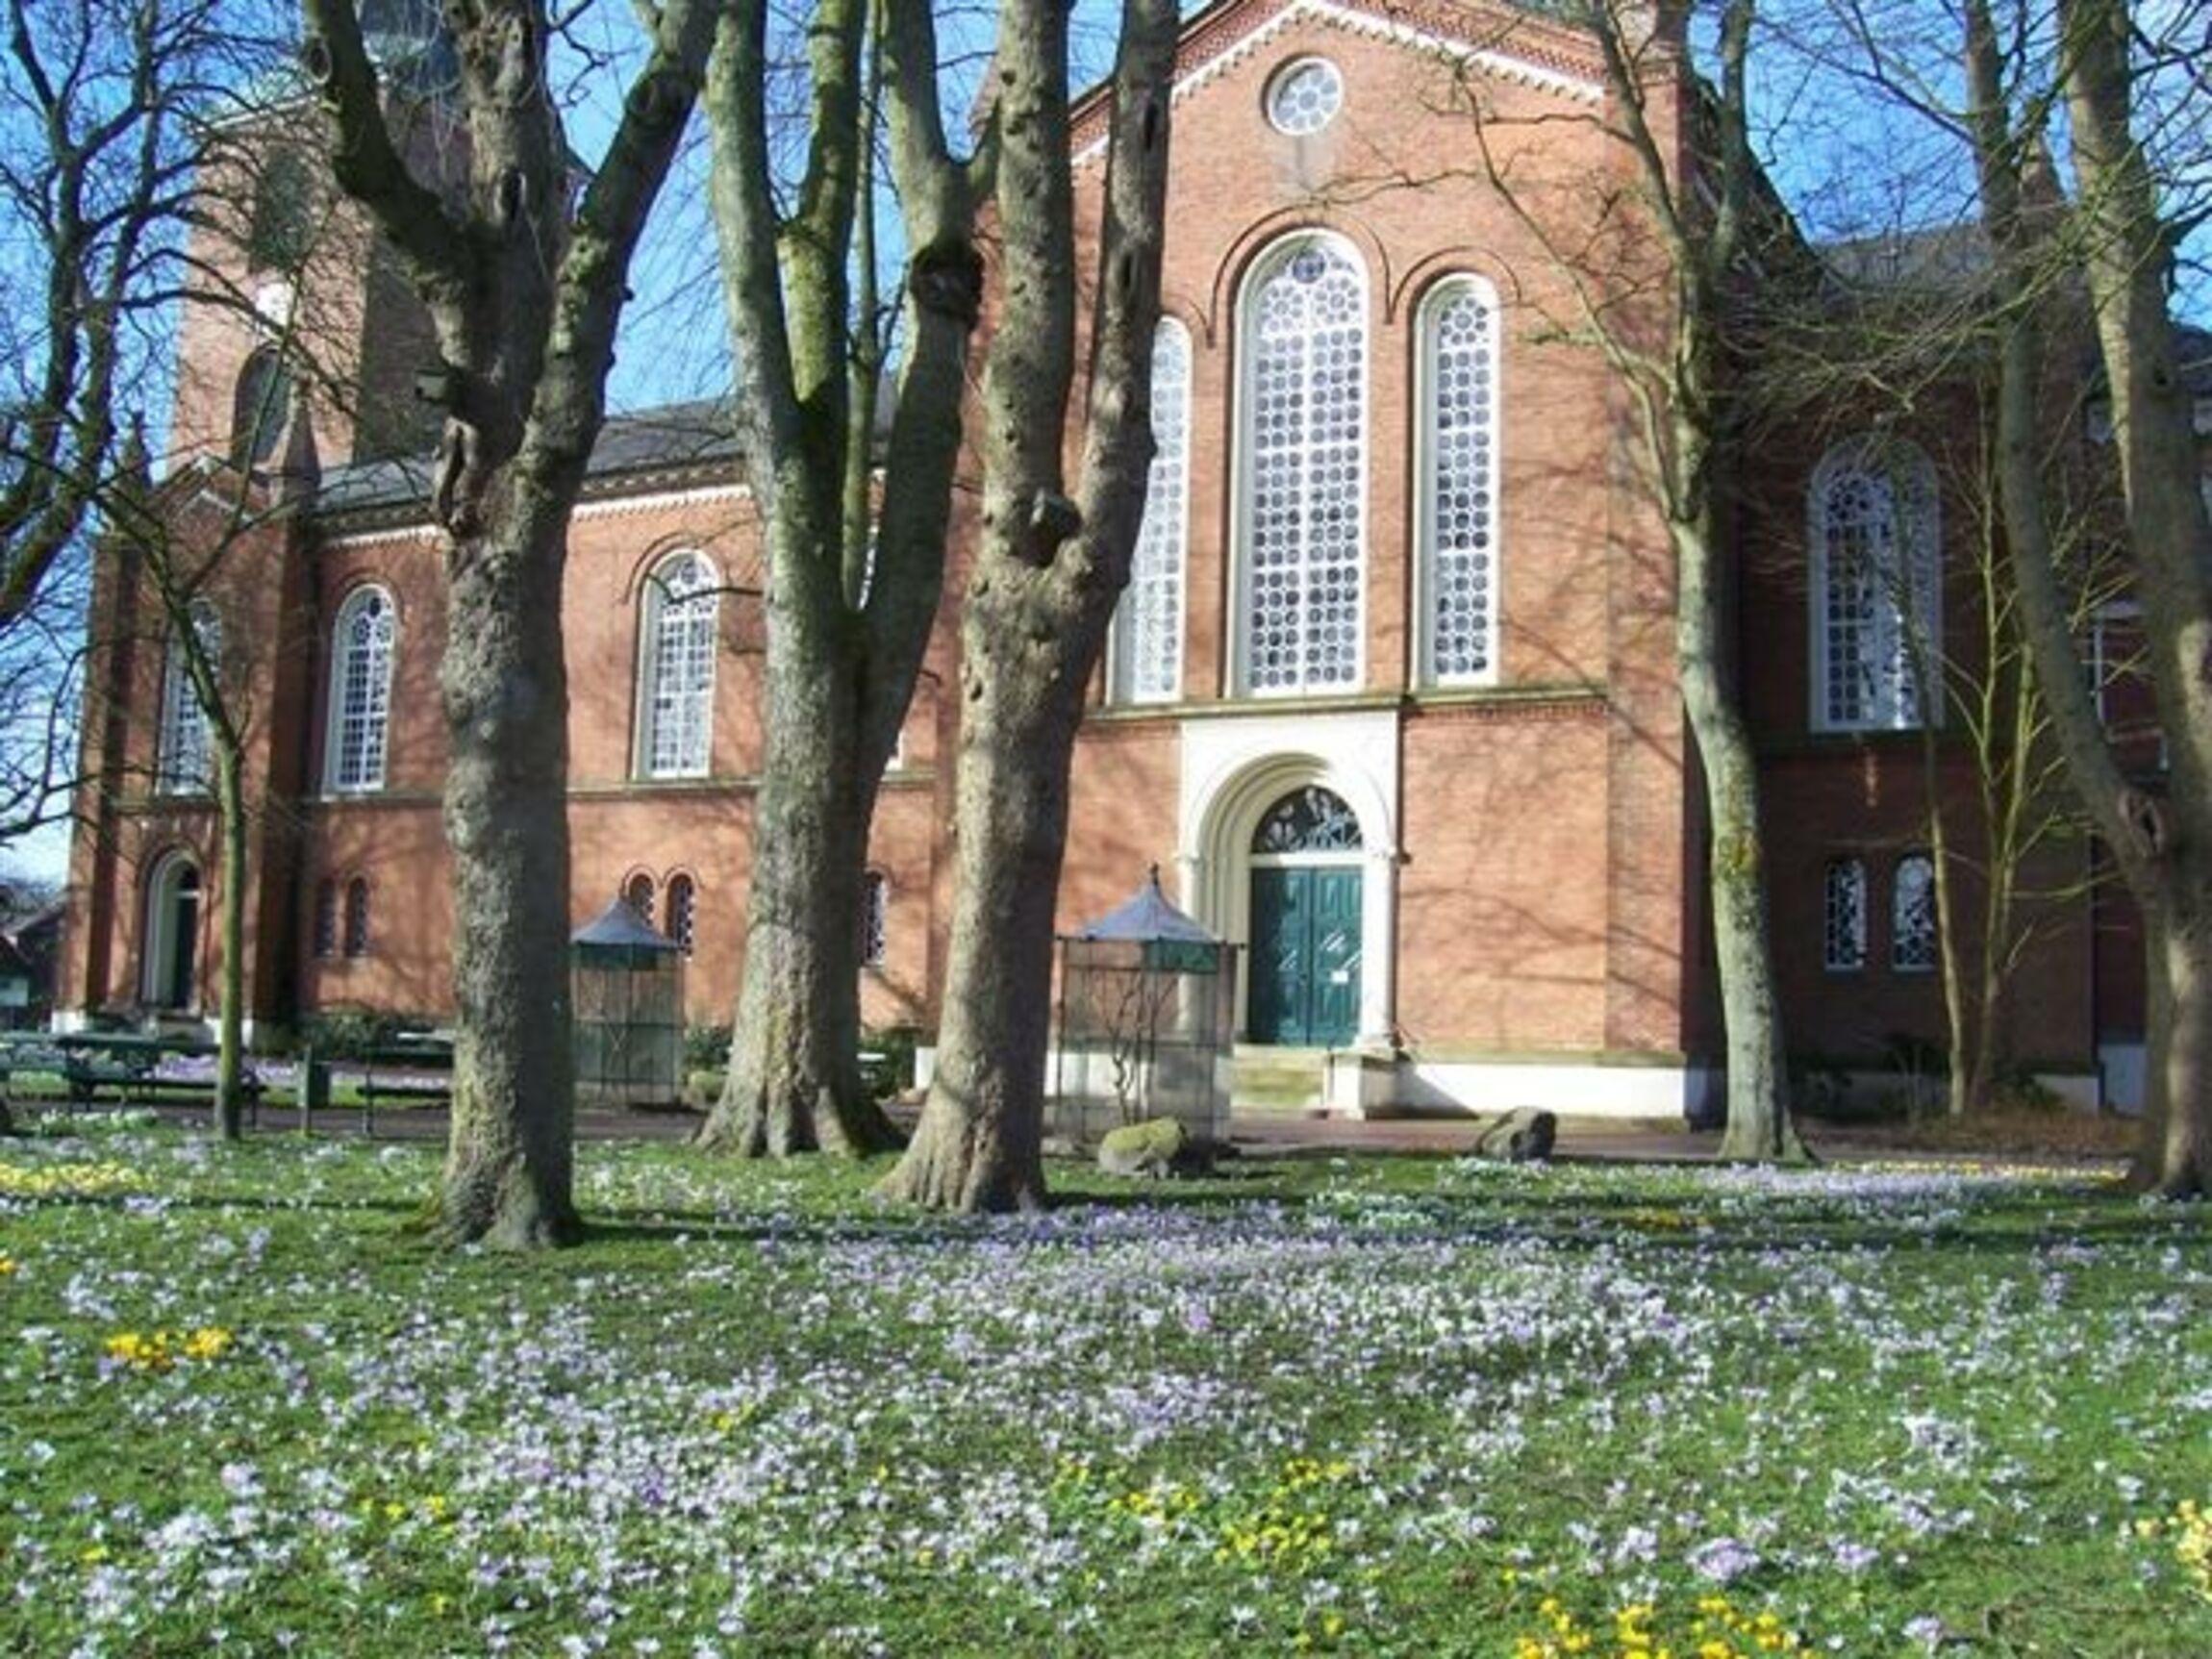 St. Magnuskirche Esens